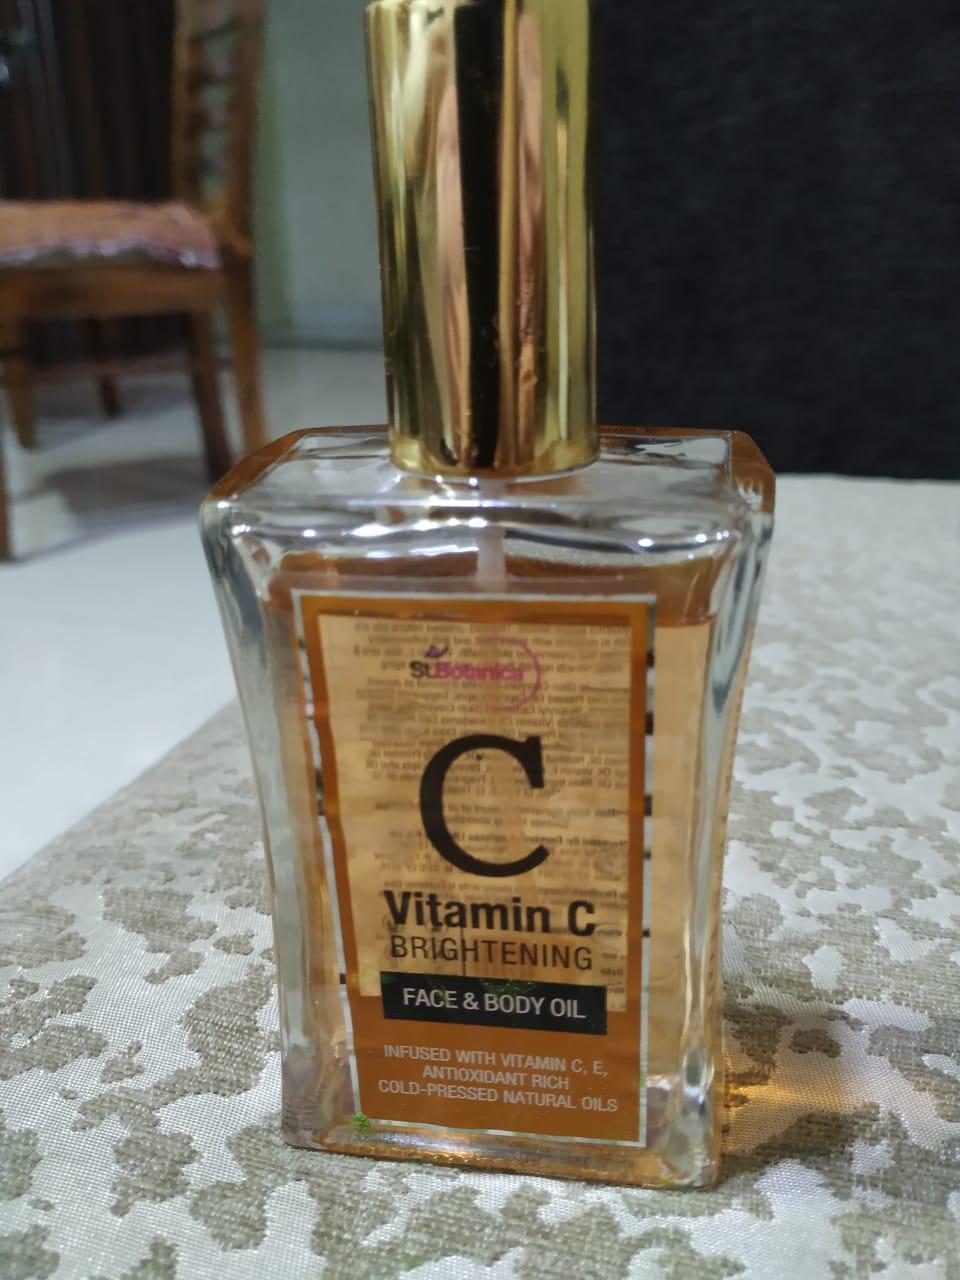 St.Botanica Vitamin C Brightening Face & Body Oil pic 2-Light Weight Formula.. Must Try-By rita_punjabi